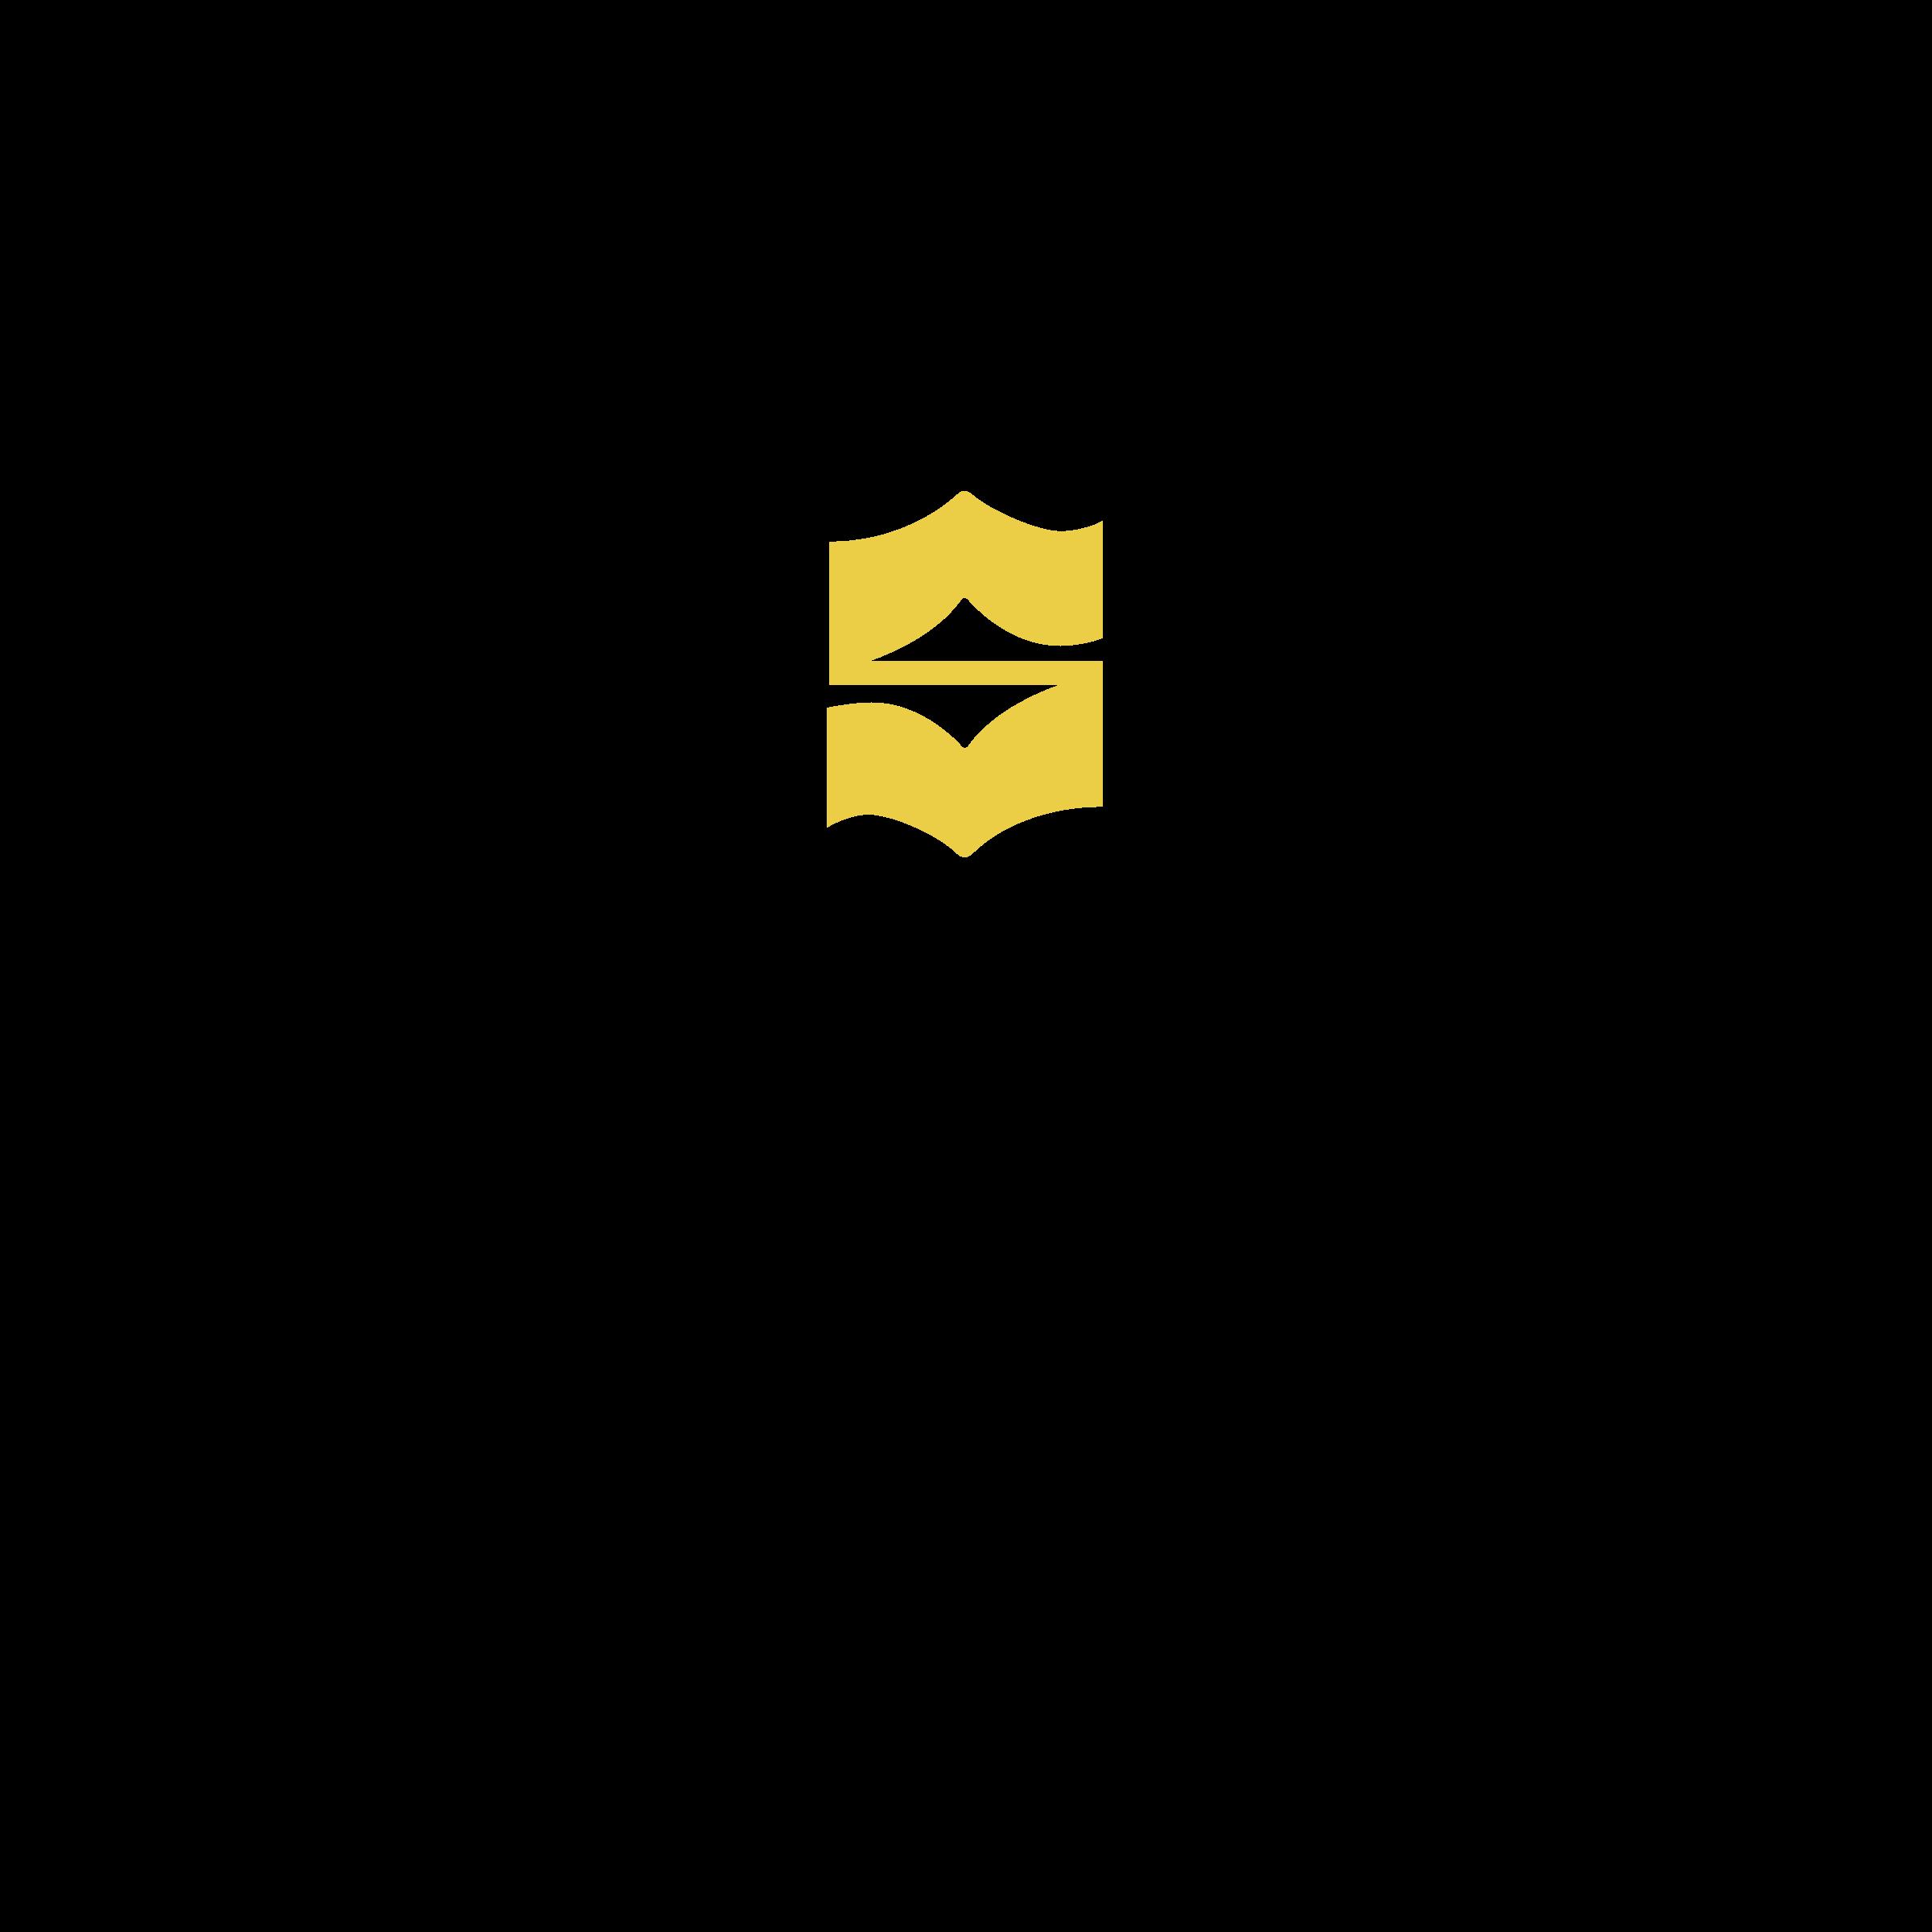 Logo Seigneurie - Shangri La Logo Png Transparent Svg Vector Freebie Supply